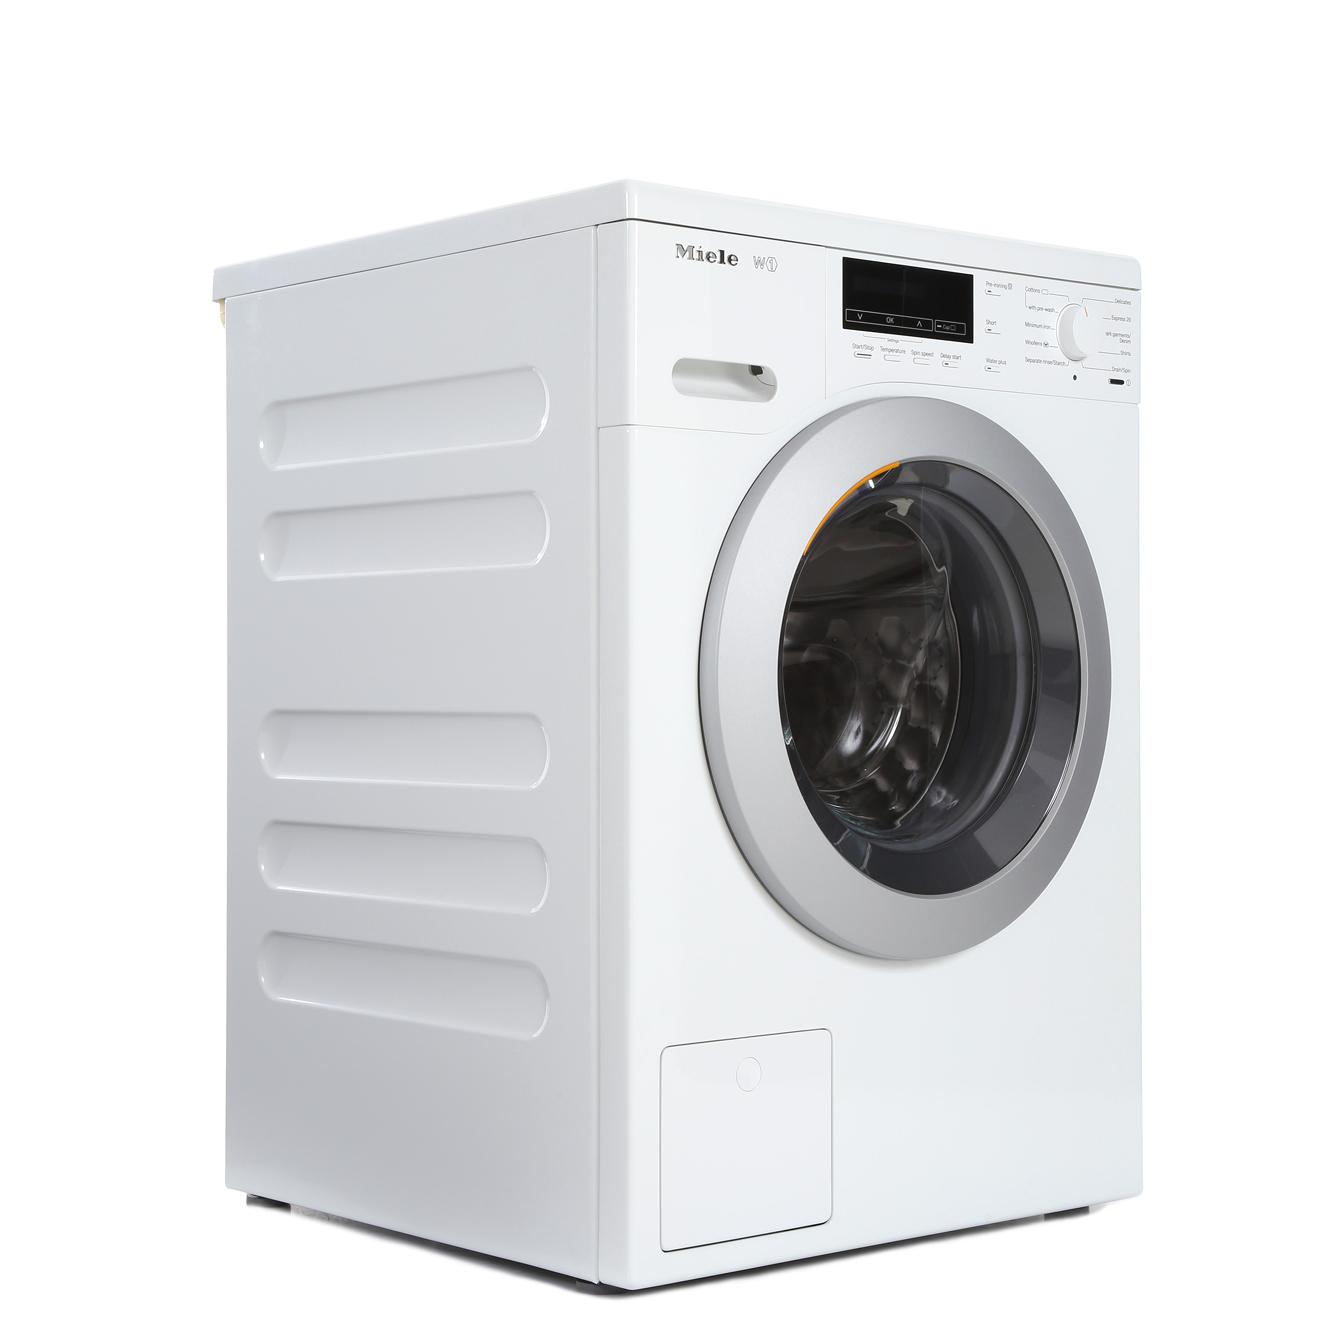 Buy Miele W1 - ChromeEdition WKB120 Washing Machine ...